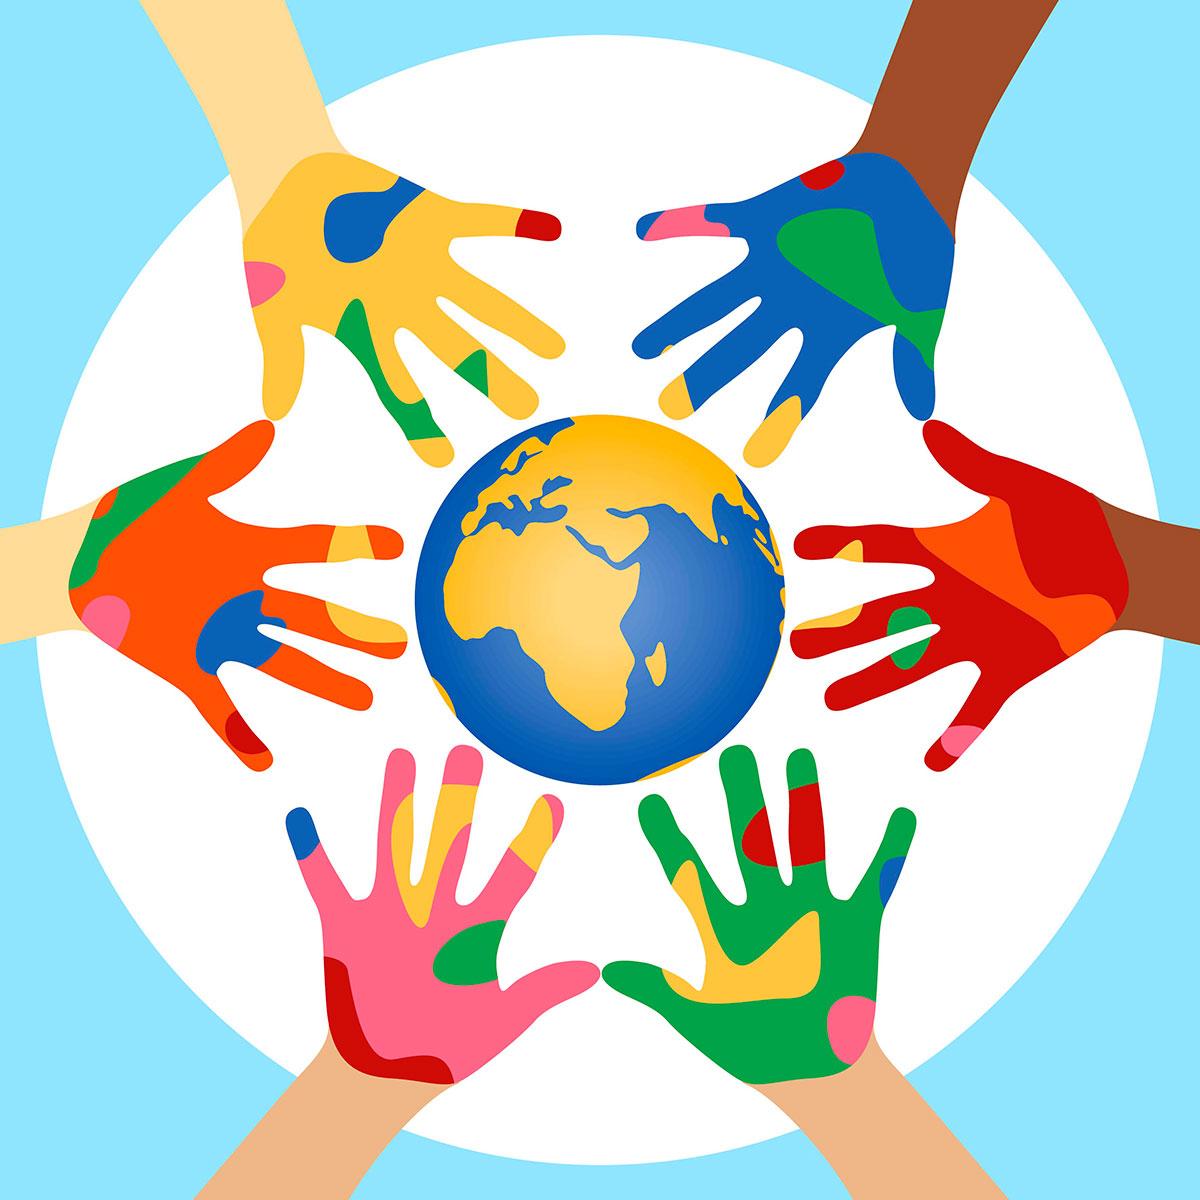 International Day /Día Internacional -